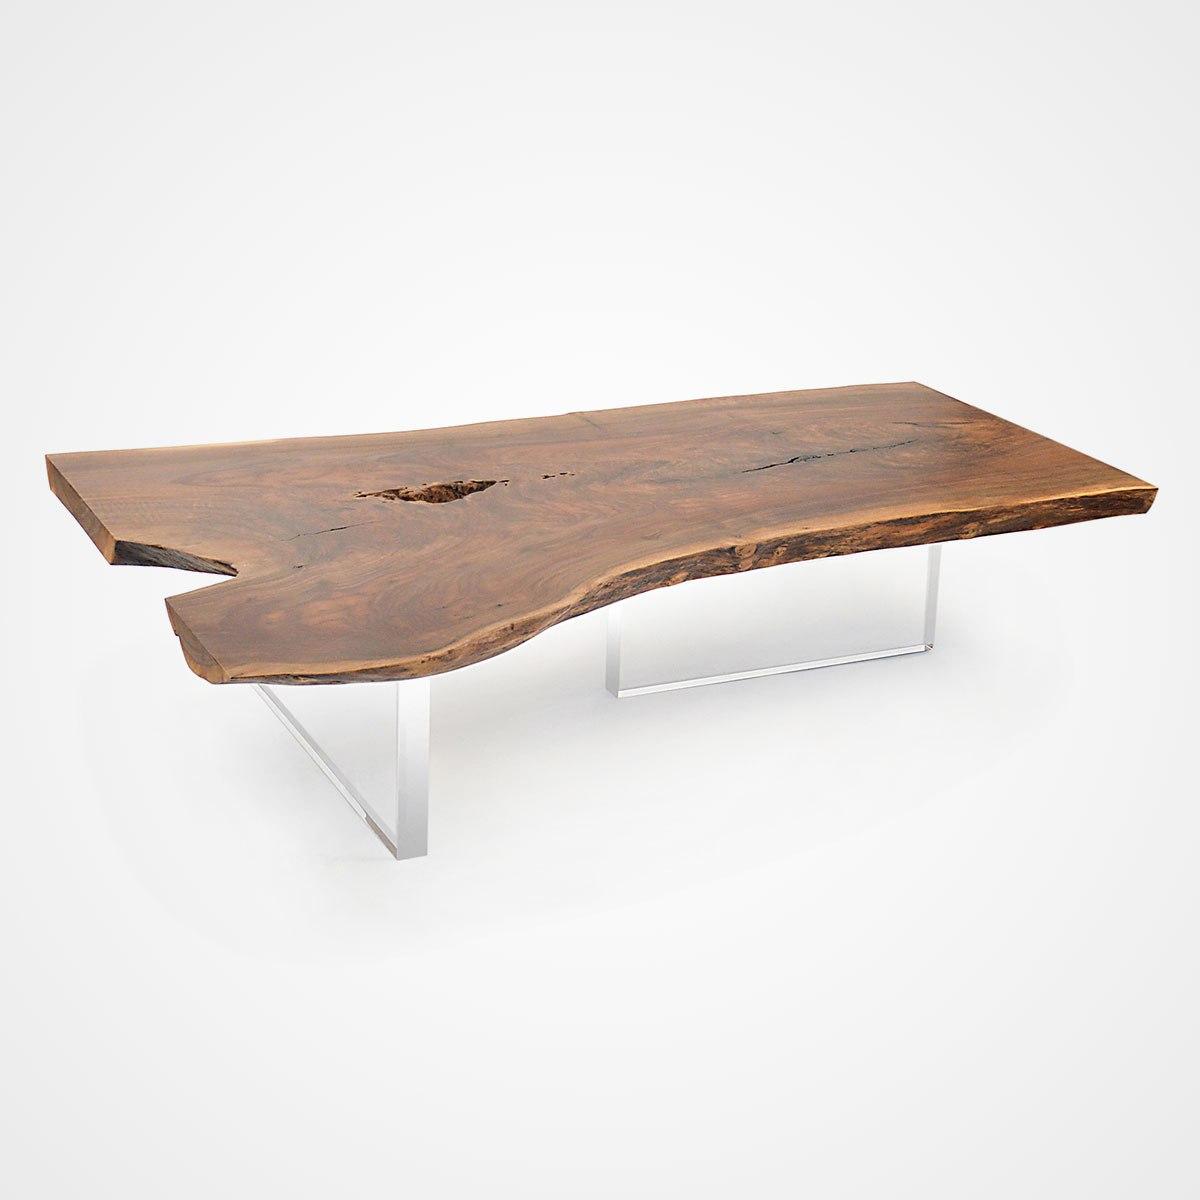 walnut coffee tables live edge claro walnut coffee table - acrylic base - 002 - rotsen JDWWNPP